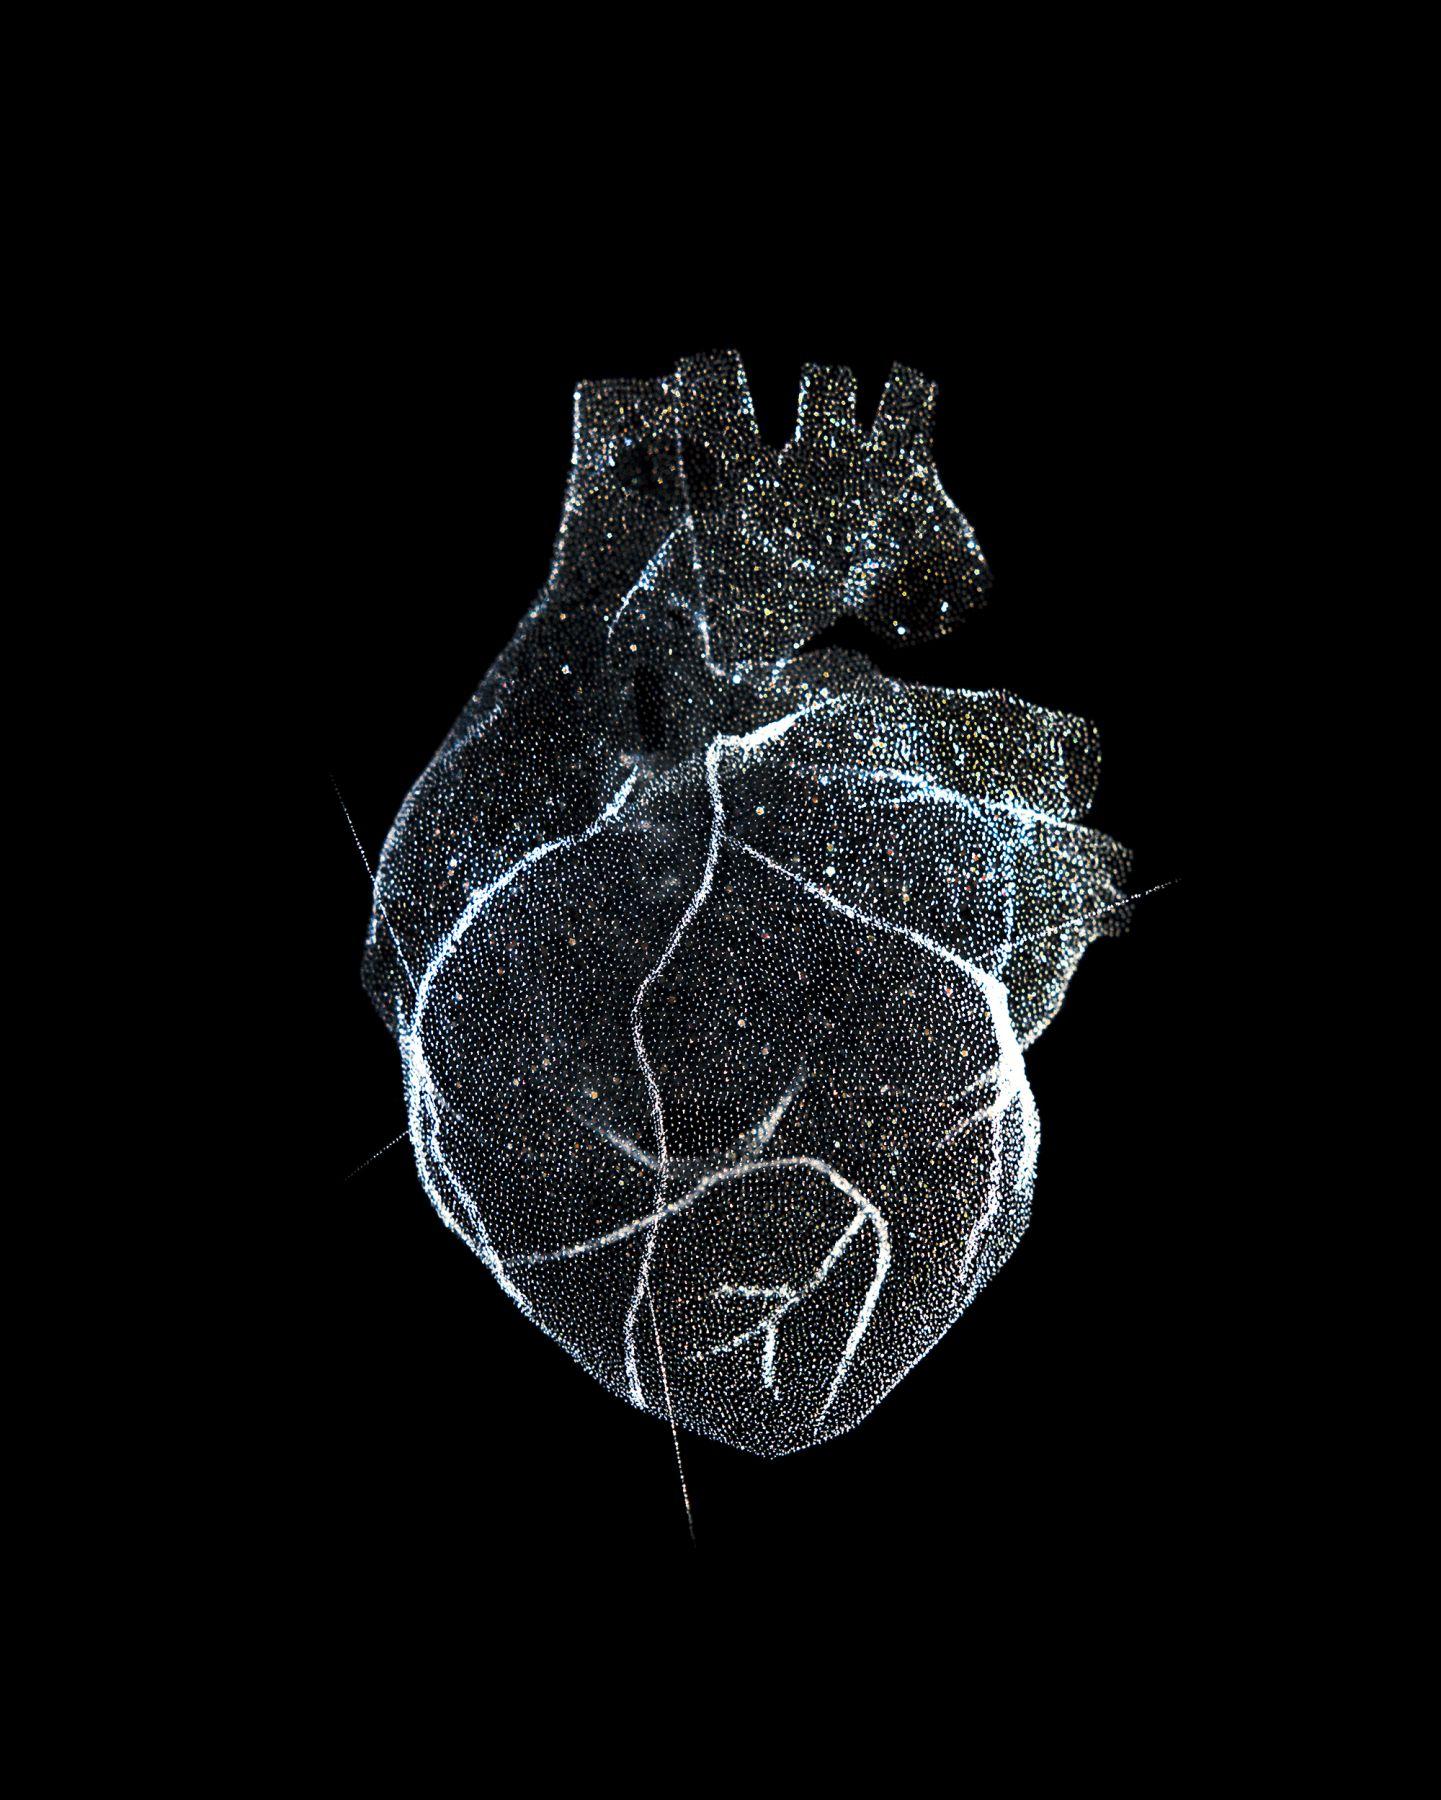 Reiner Riedler, Livesaving Machines, Glass Model of the Heart, 2012, Sous Les Etoiles Gallery